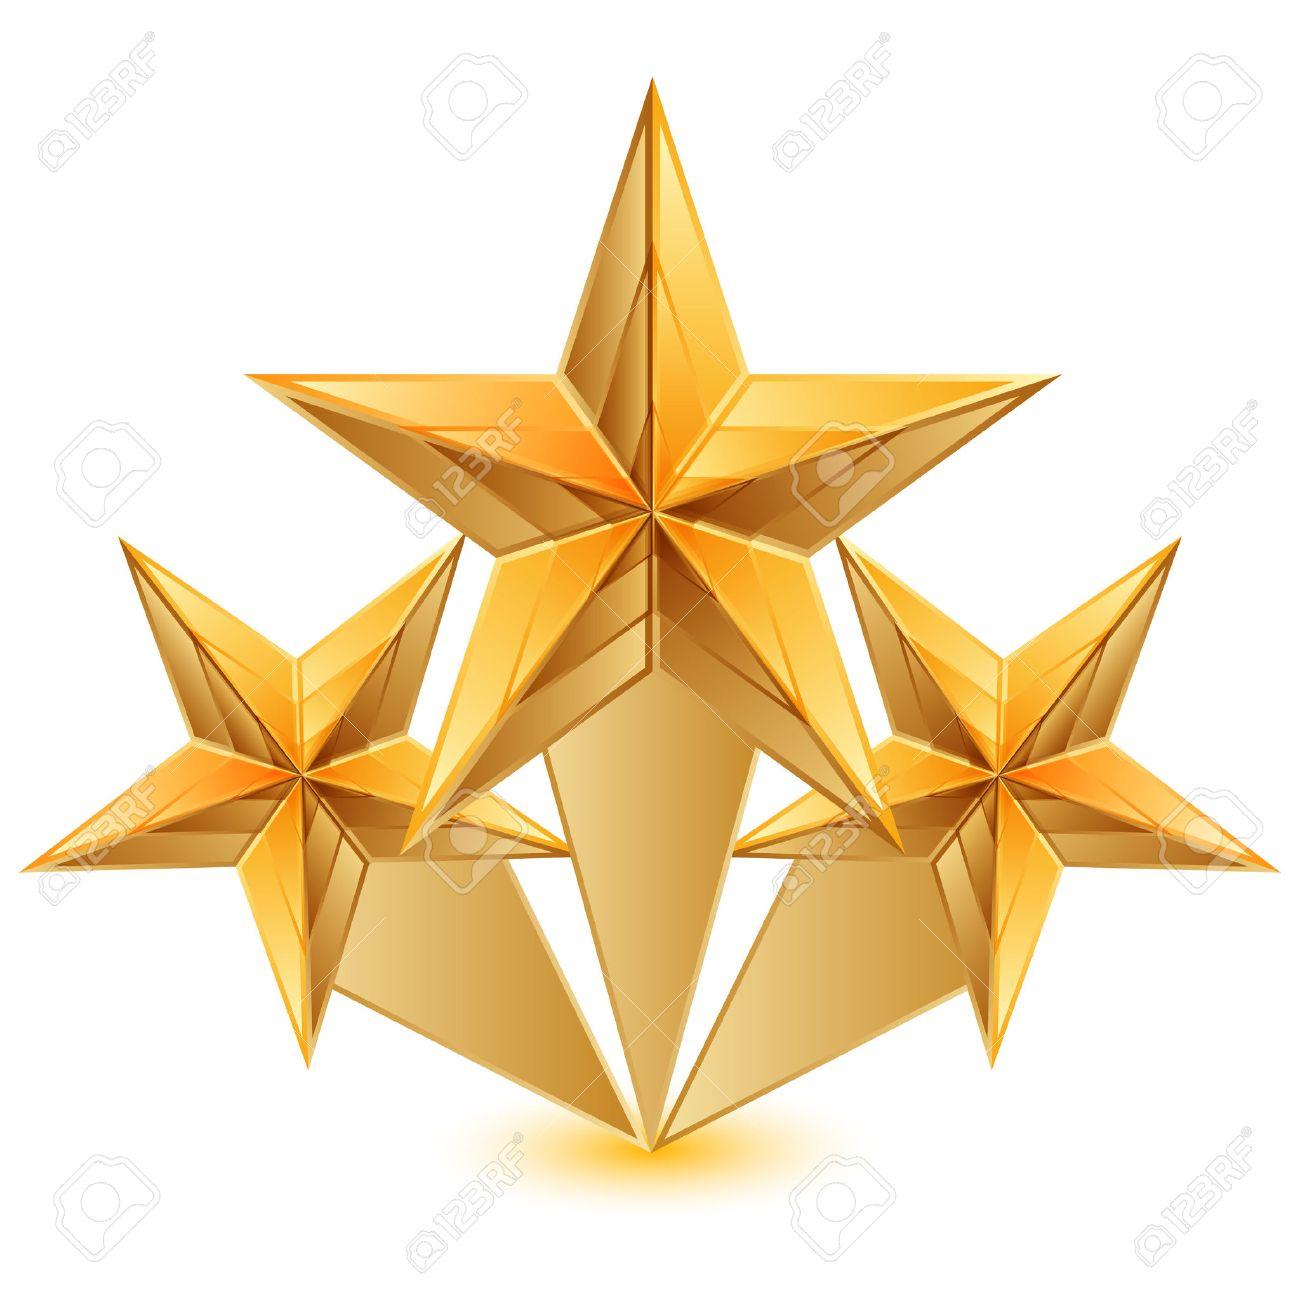 Vector illustration of 3 gold stars.